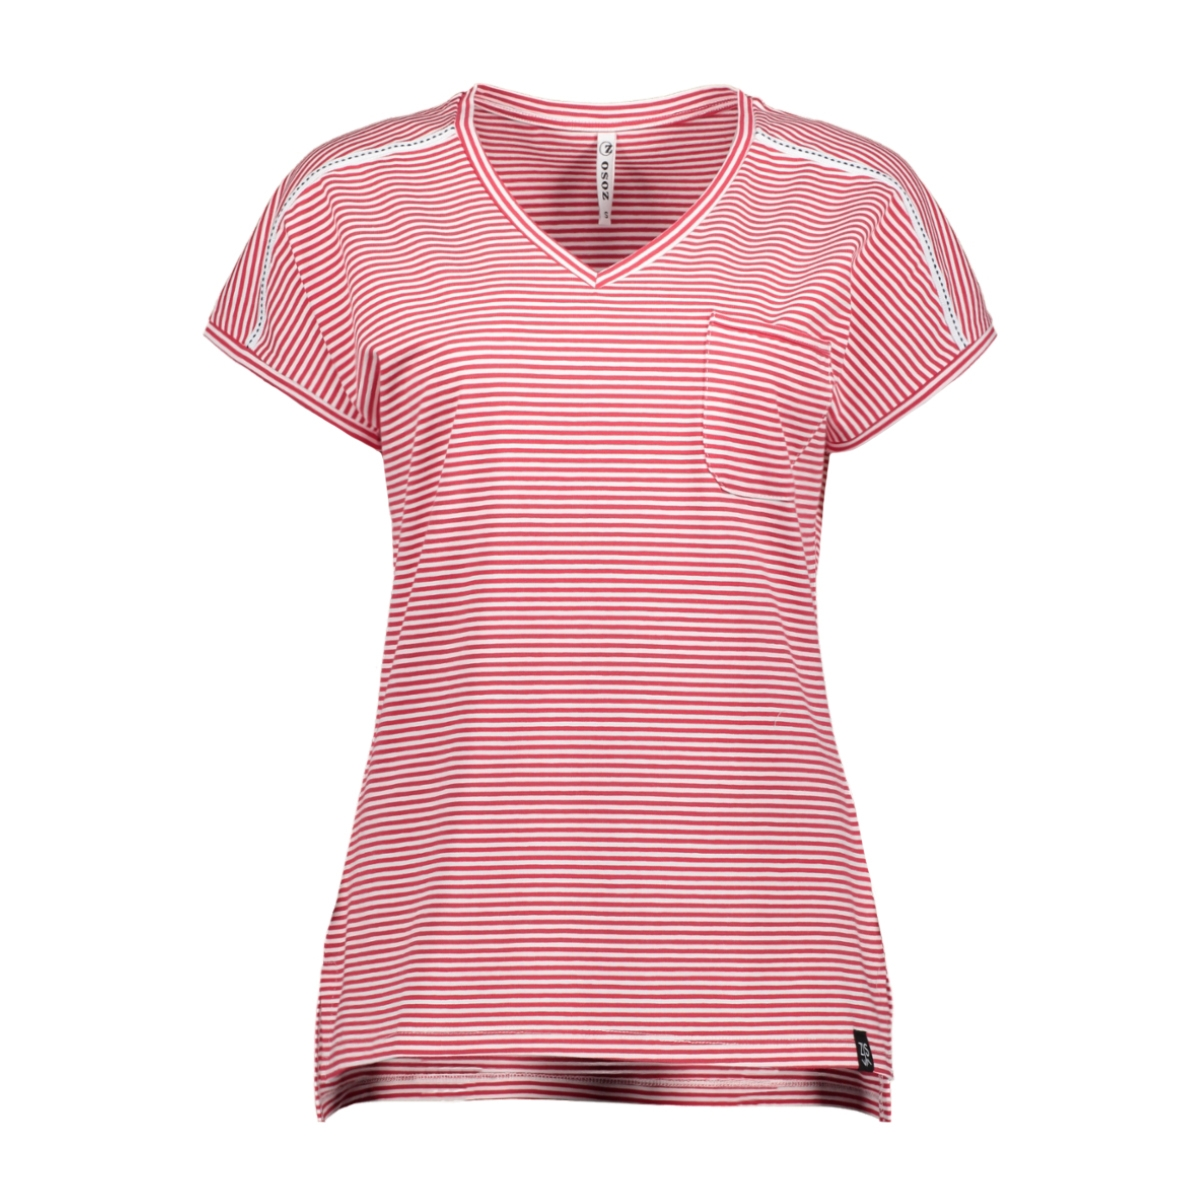 aster t shirt 193 zoso t-shirt red/white